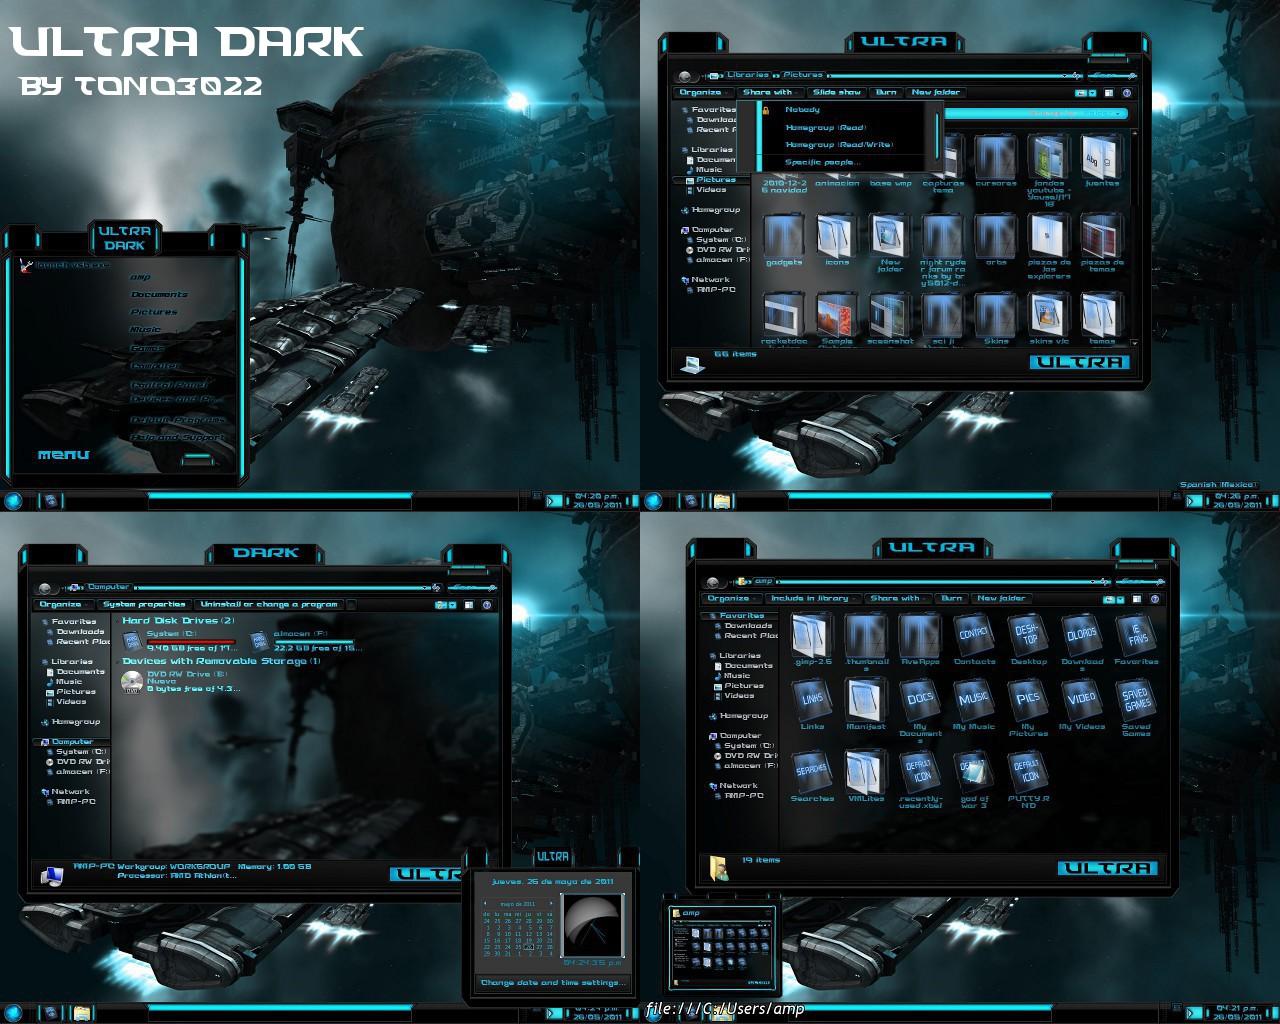 windows 7 theme blue glass (ultra dark) by customizewin7 on